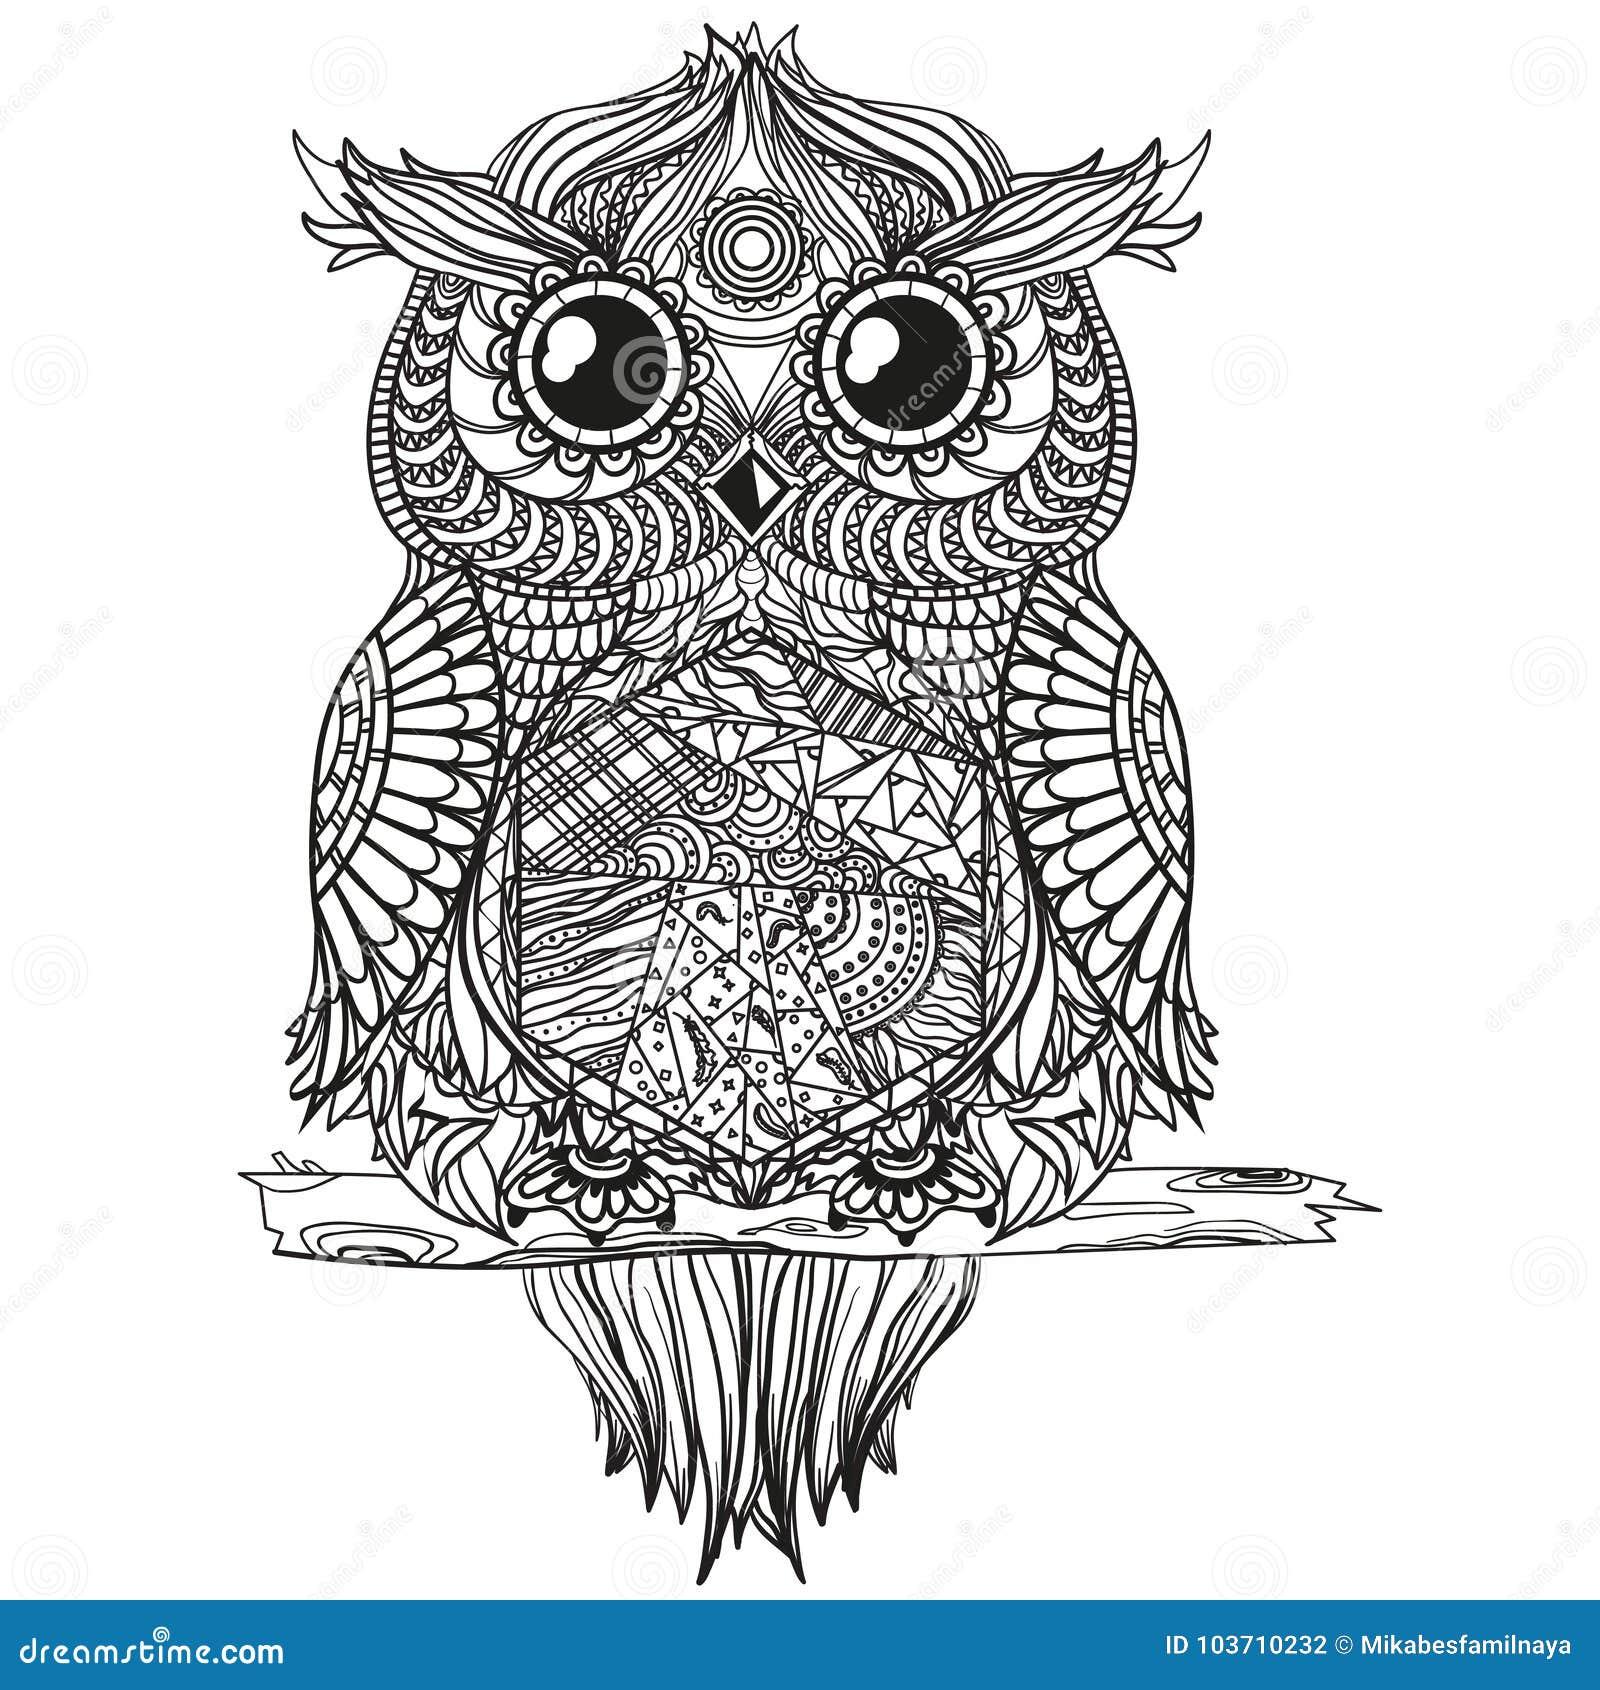 mandala mit eule vektor abbildung. illustration von eule